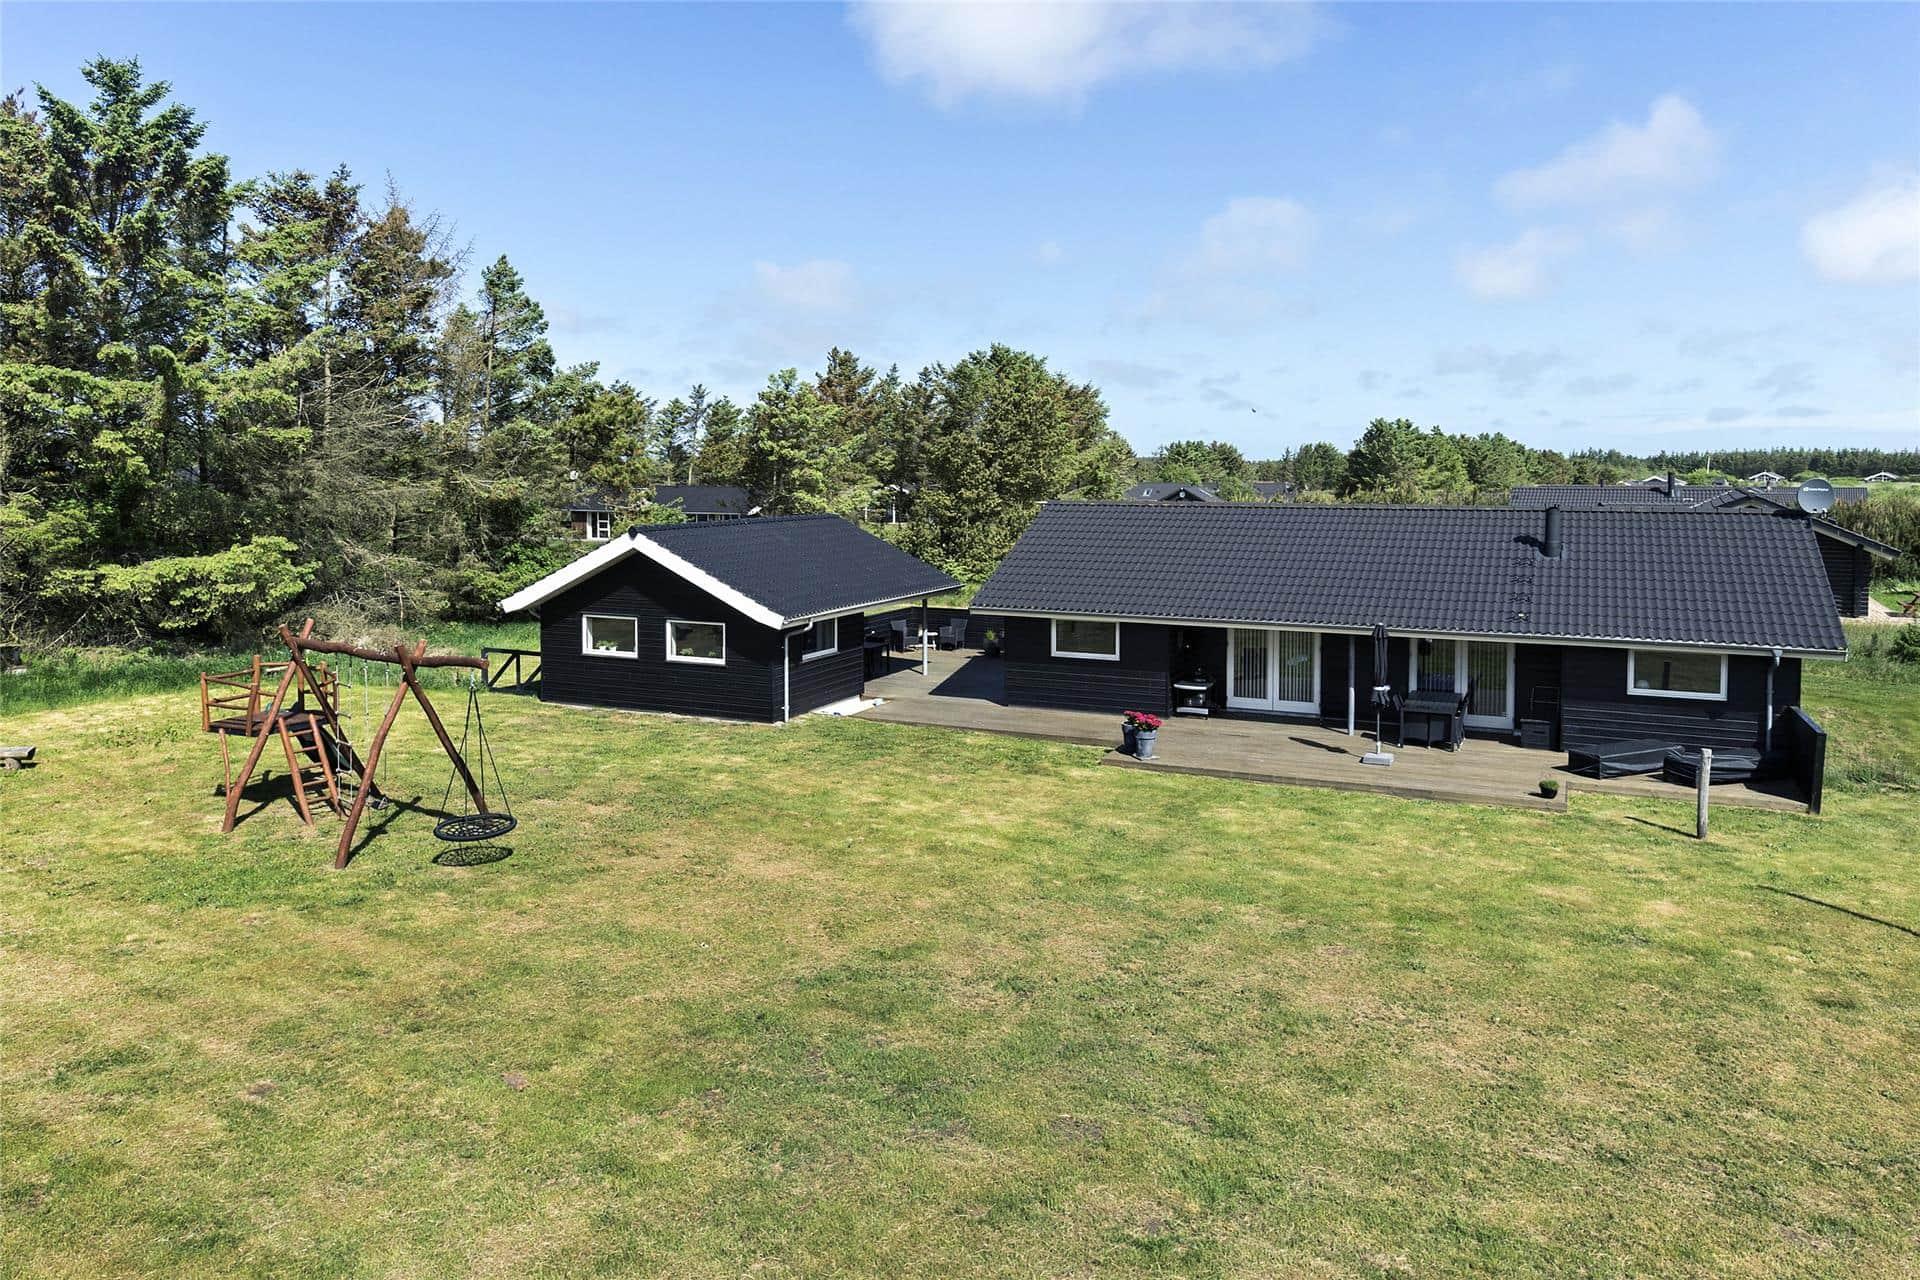 Image 1-177 Holiday-home LK902, Mievej 42, DK - 9480 Løkken